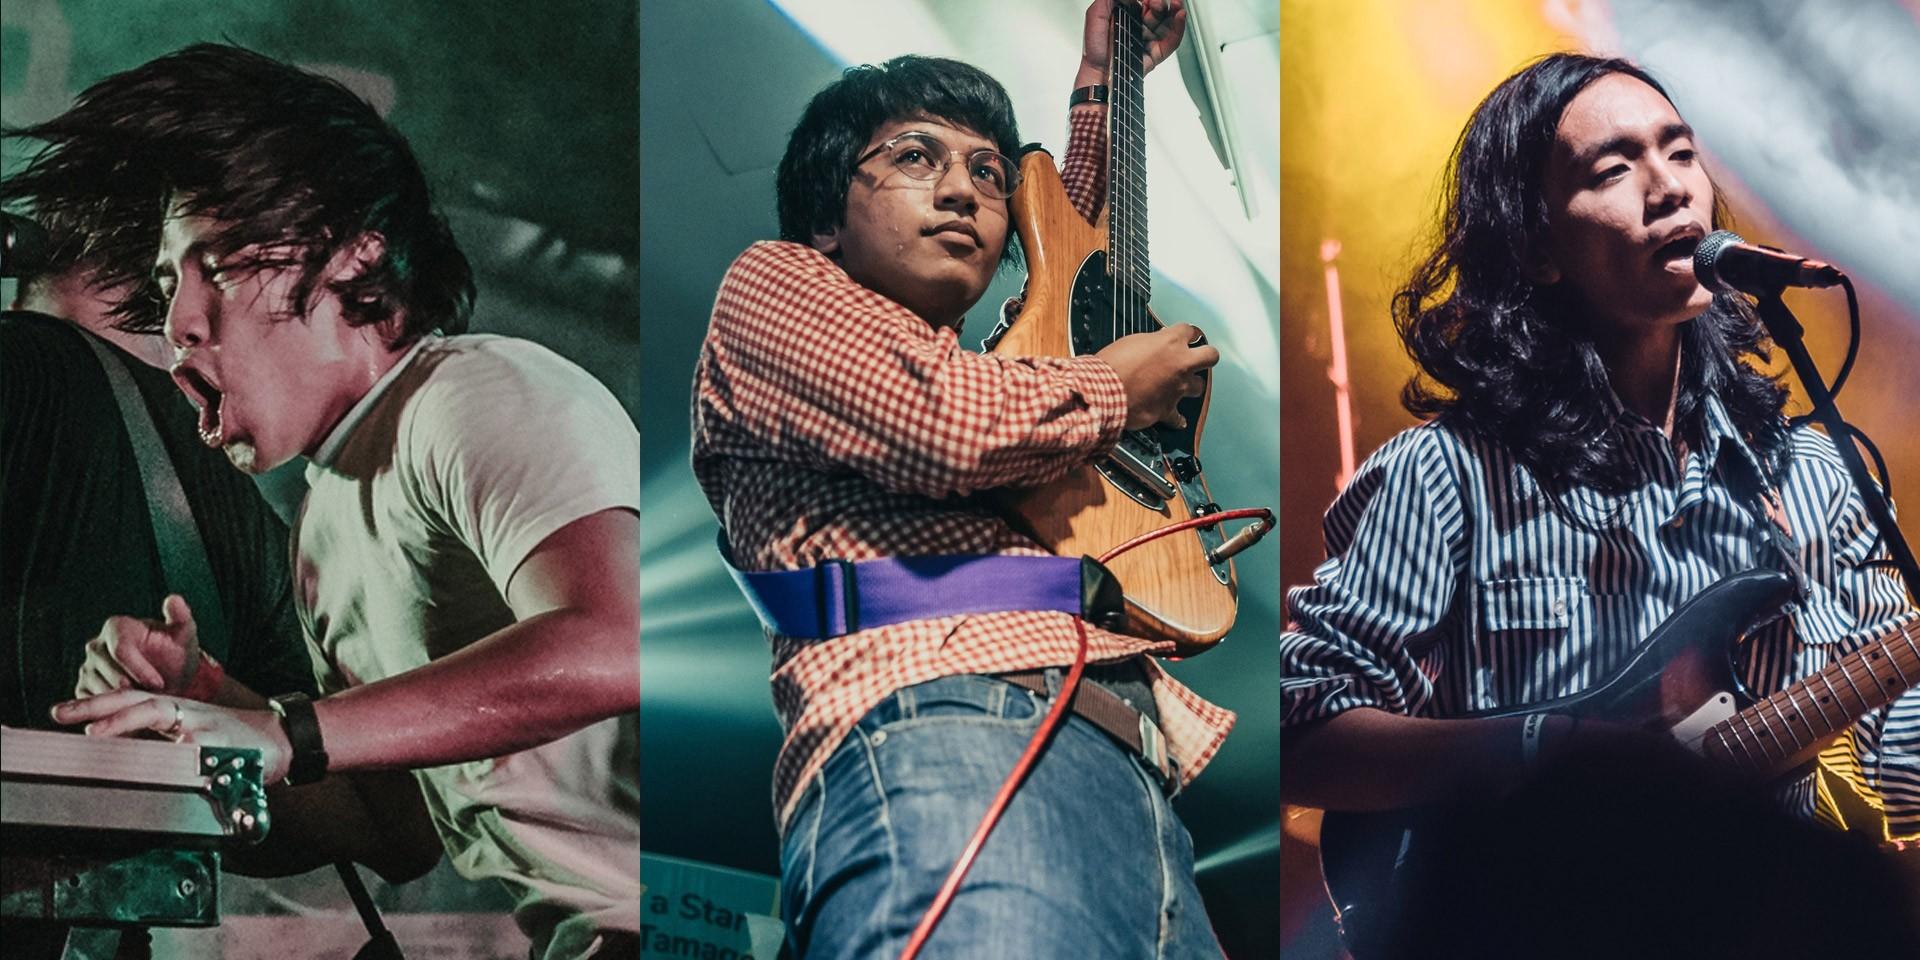 Cheats, Oh, Flamingo!, Munimuni, and more to perform at Vinyl Day 2019